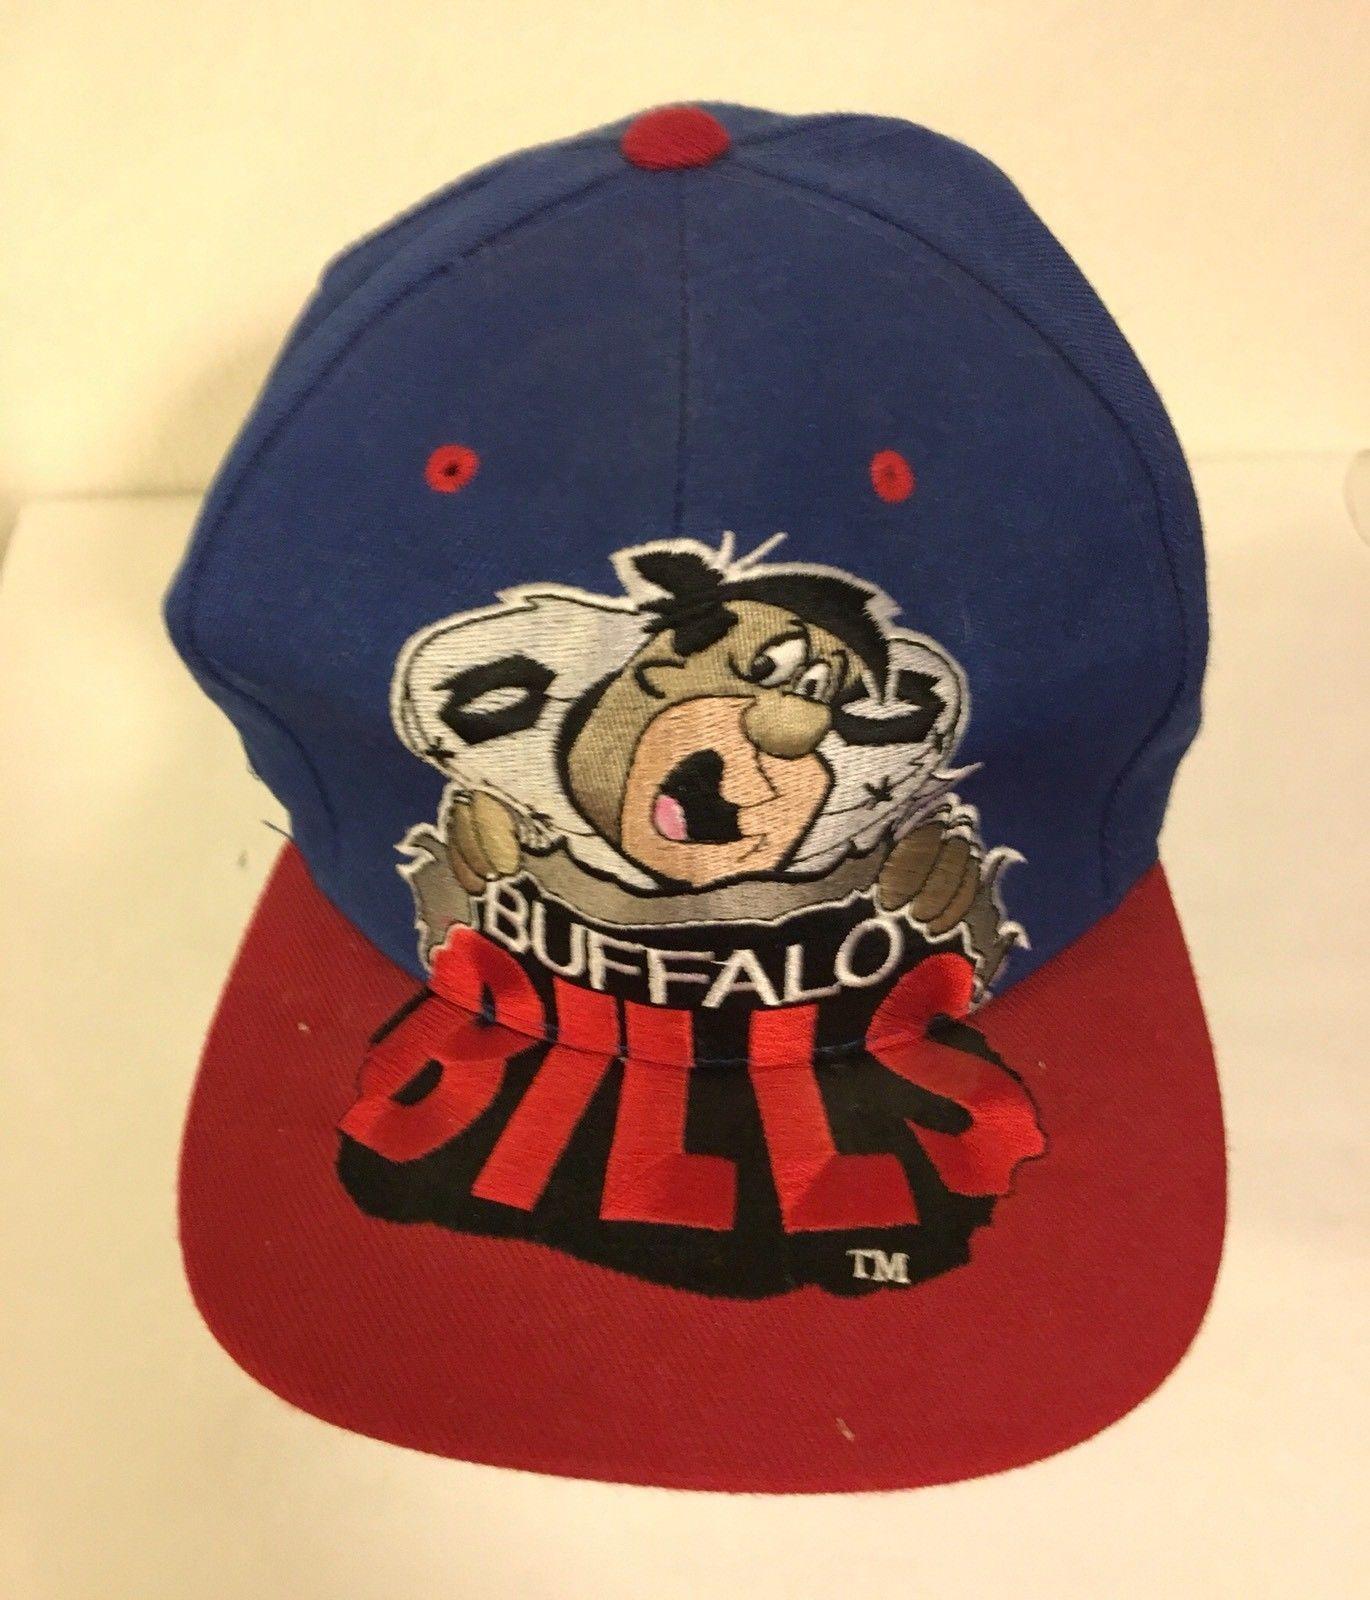 e7168ca39 Fred Flintstone Buffalo Bills NFL Snapback and similar items